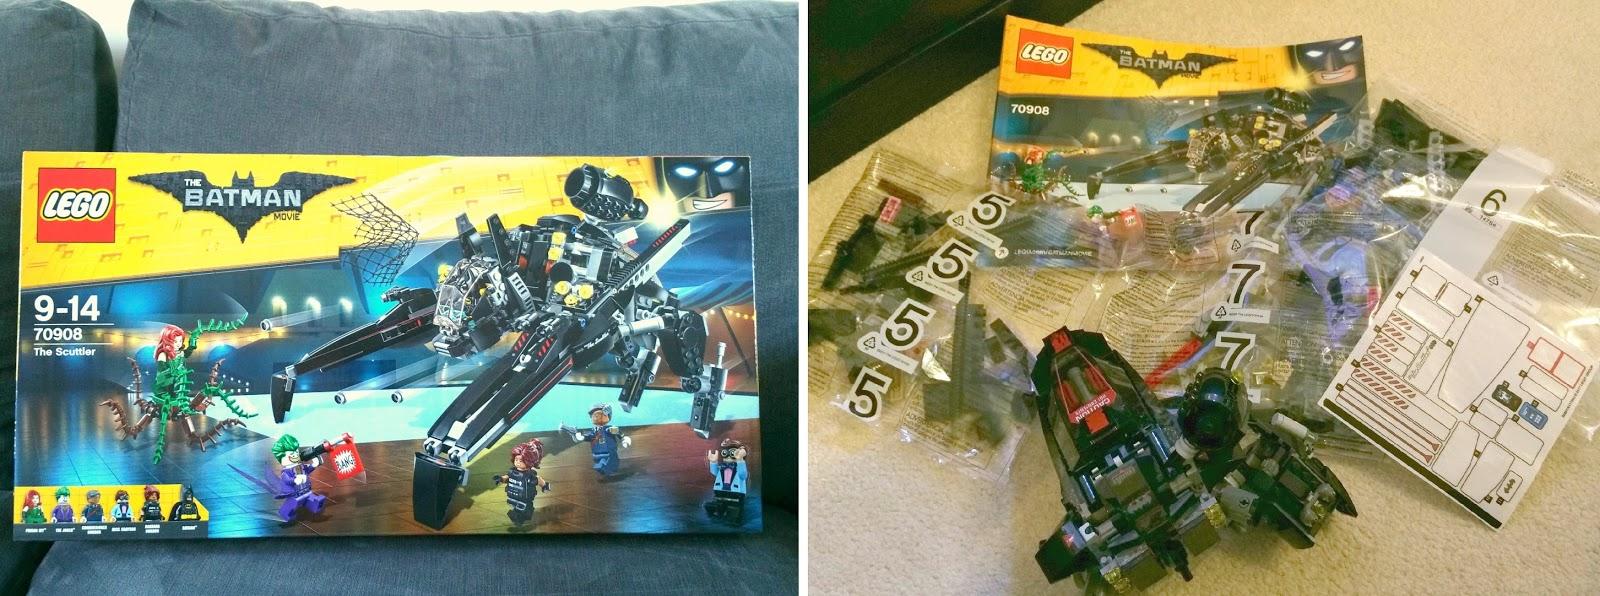 LEGO Batman Movie, Batman gifts, LEGO review